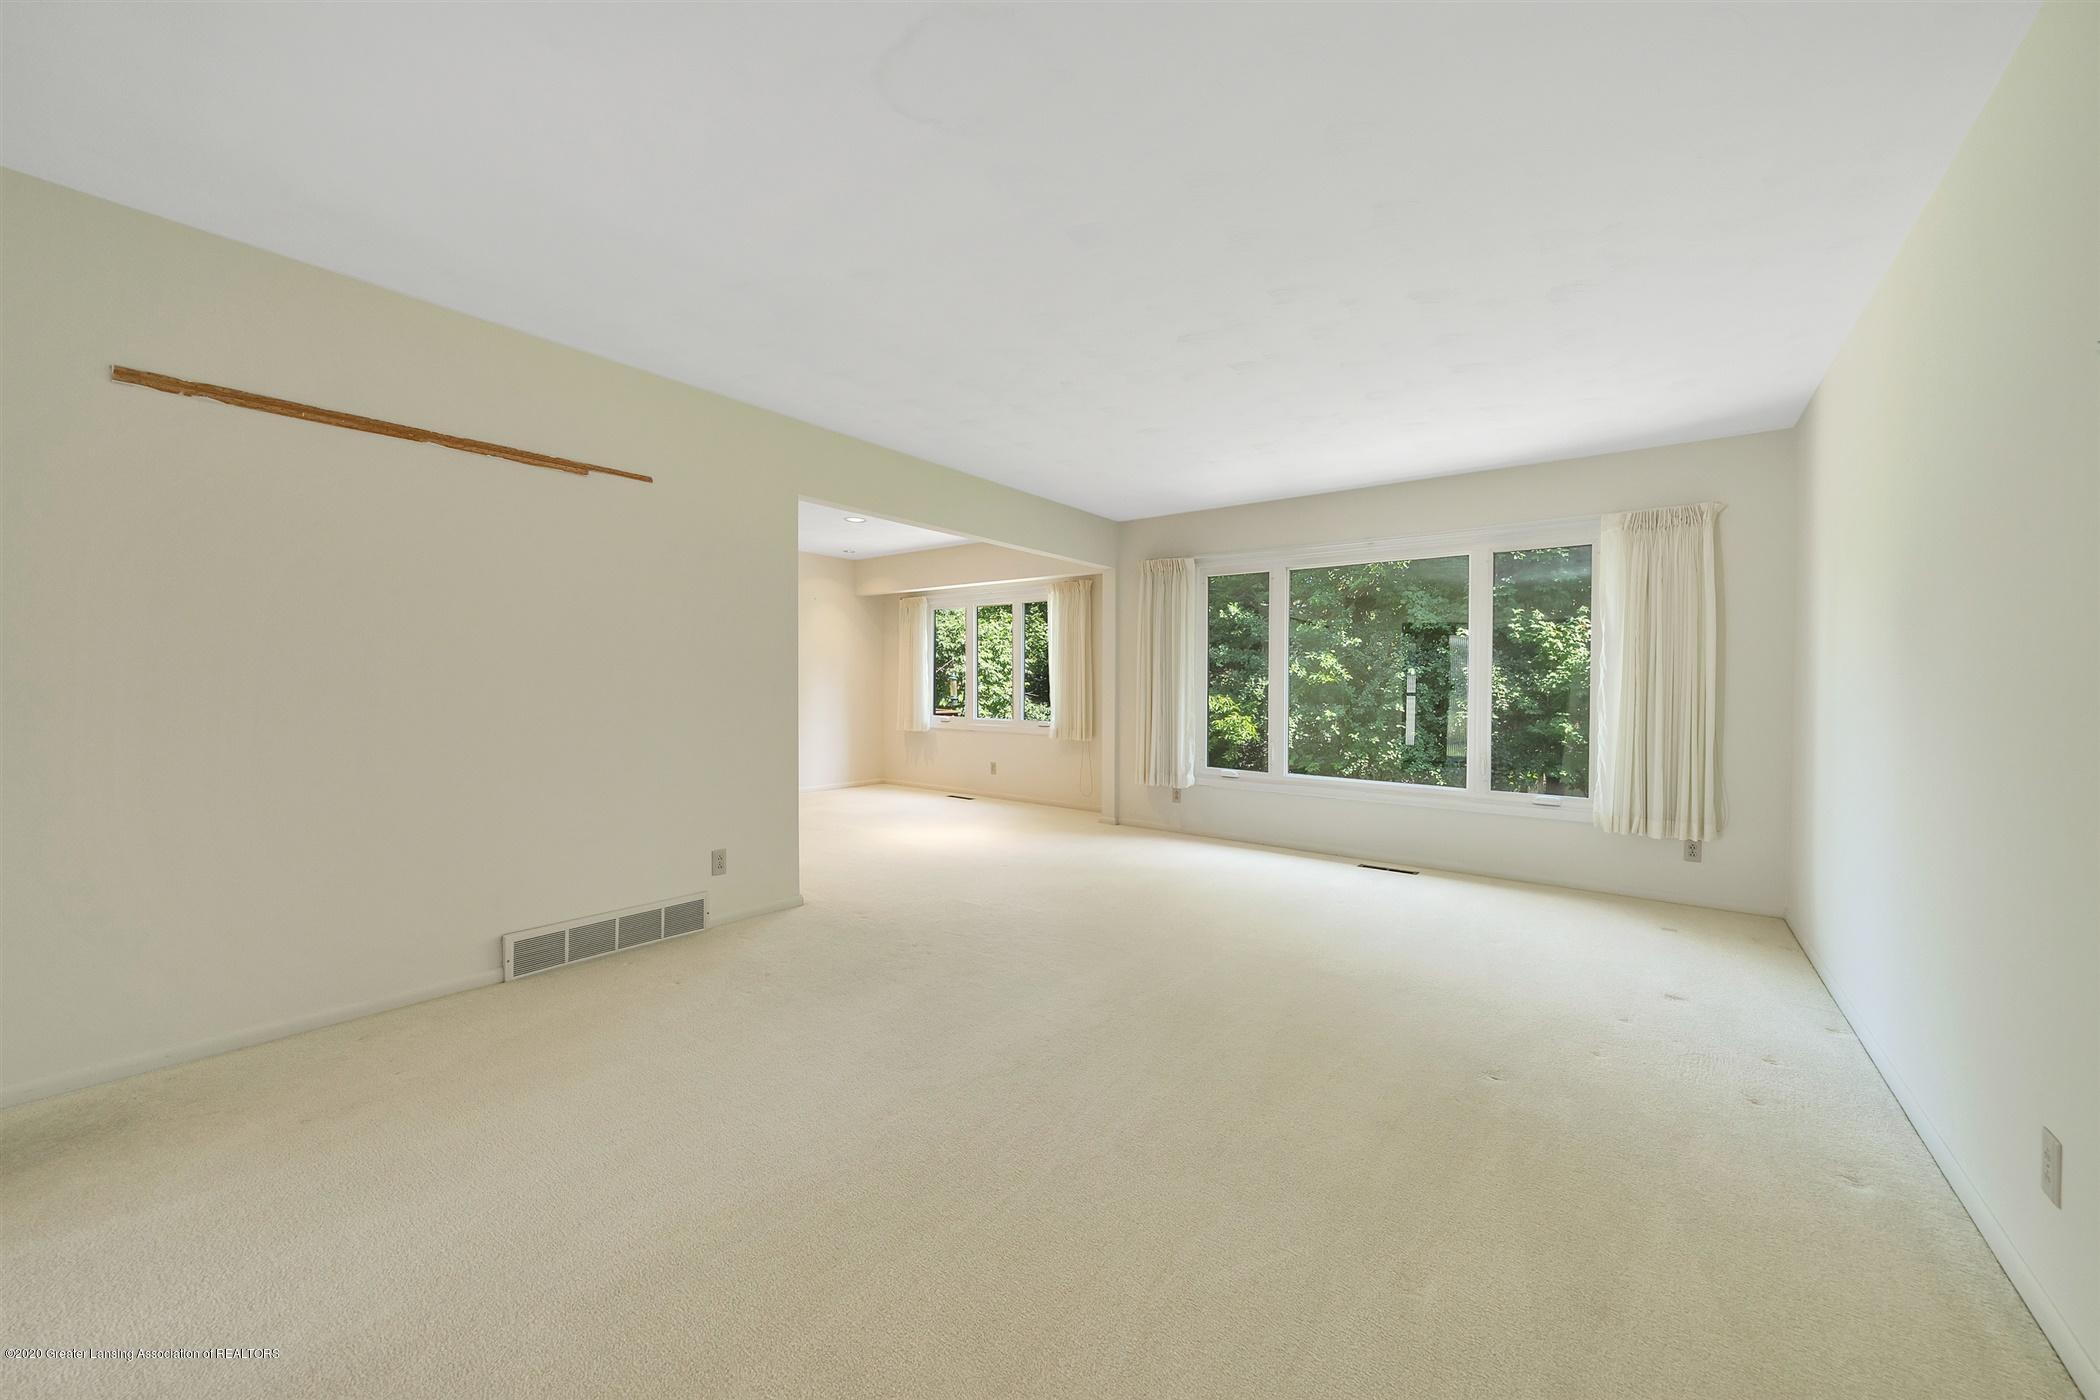 2150 Arundel Pl - (5) MAIN FLOOR Living Room - 6